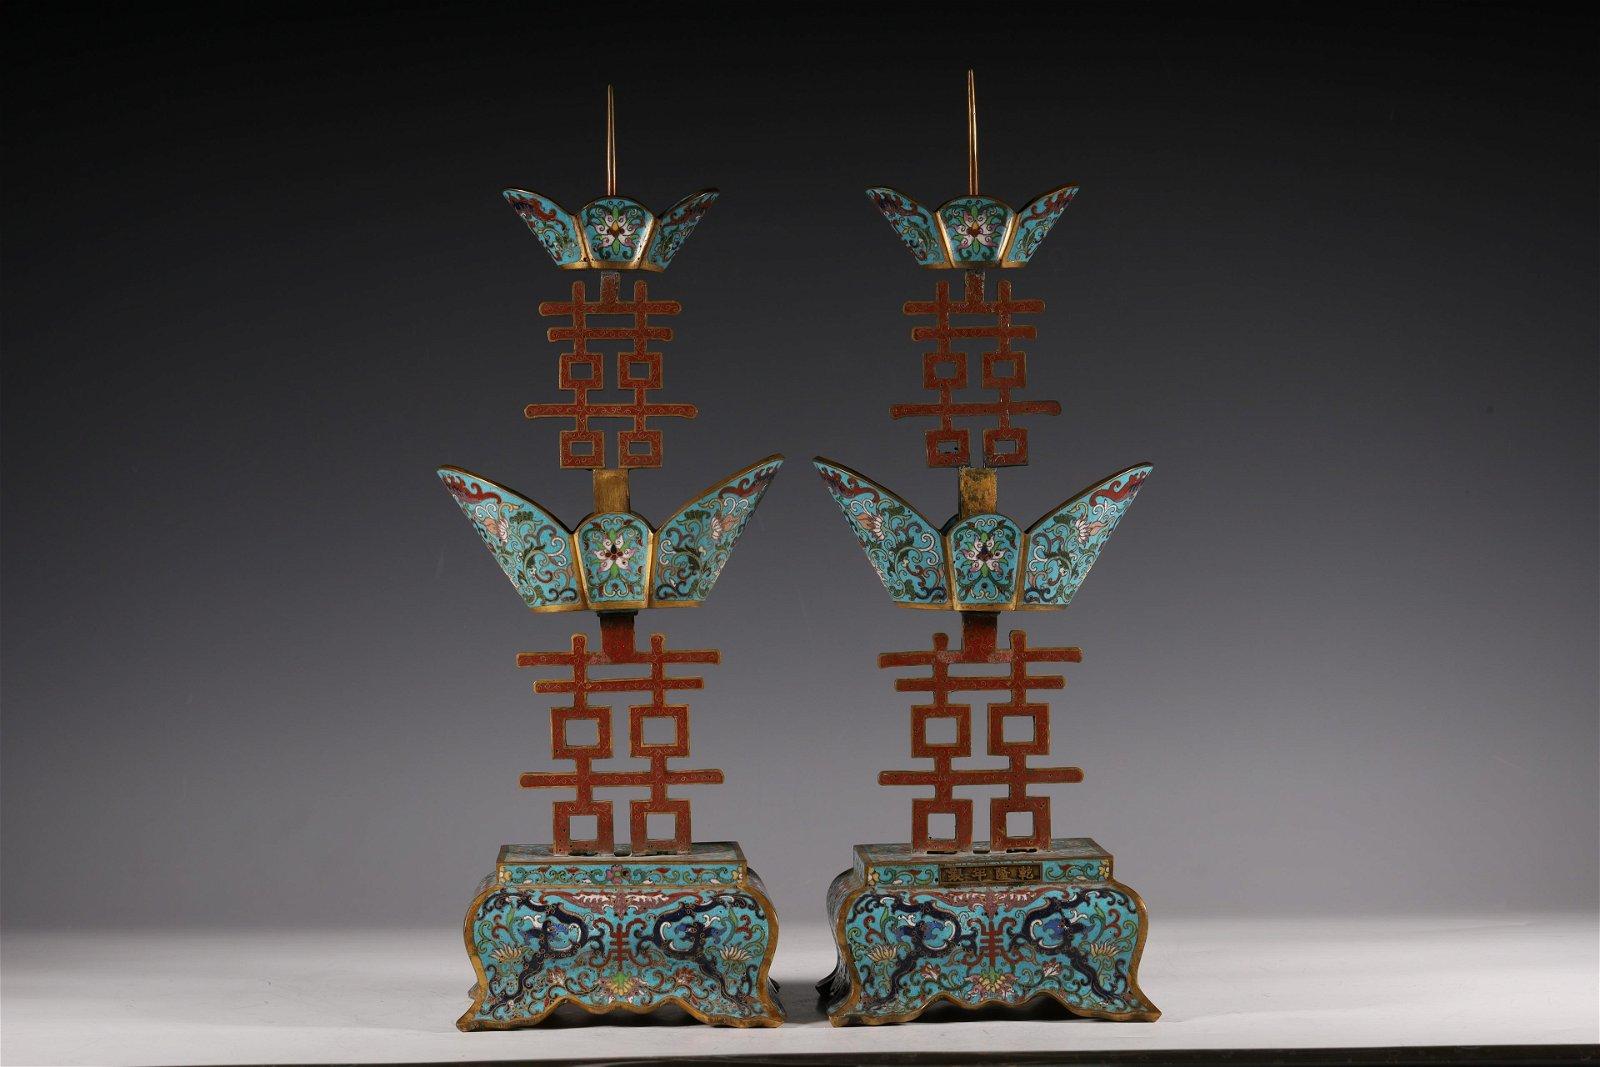 A pair of cloisonne candlesticks